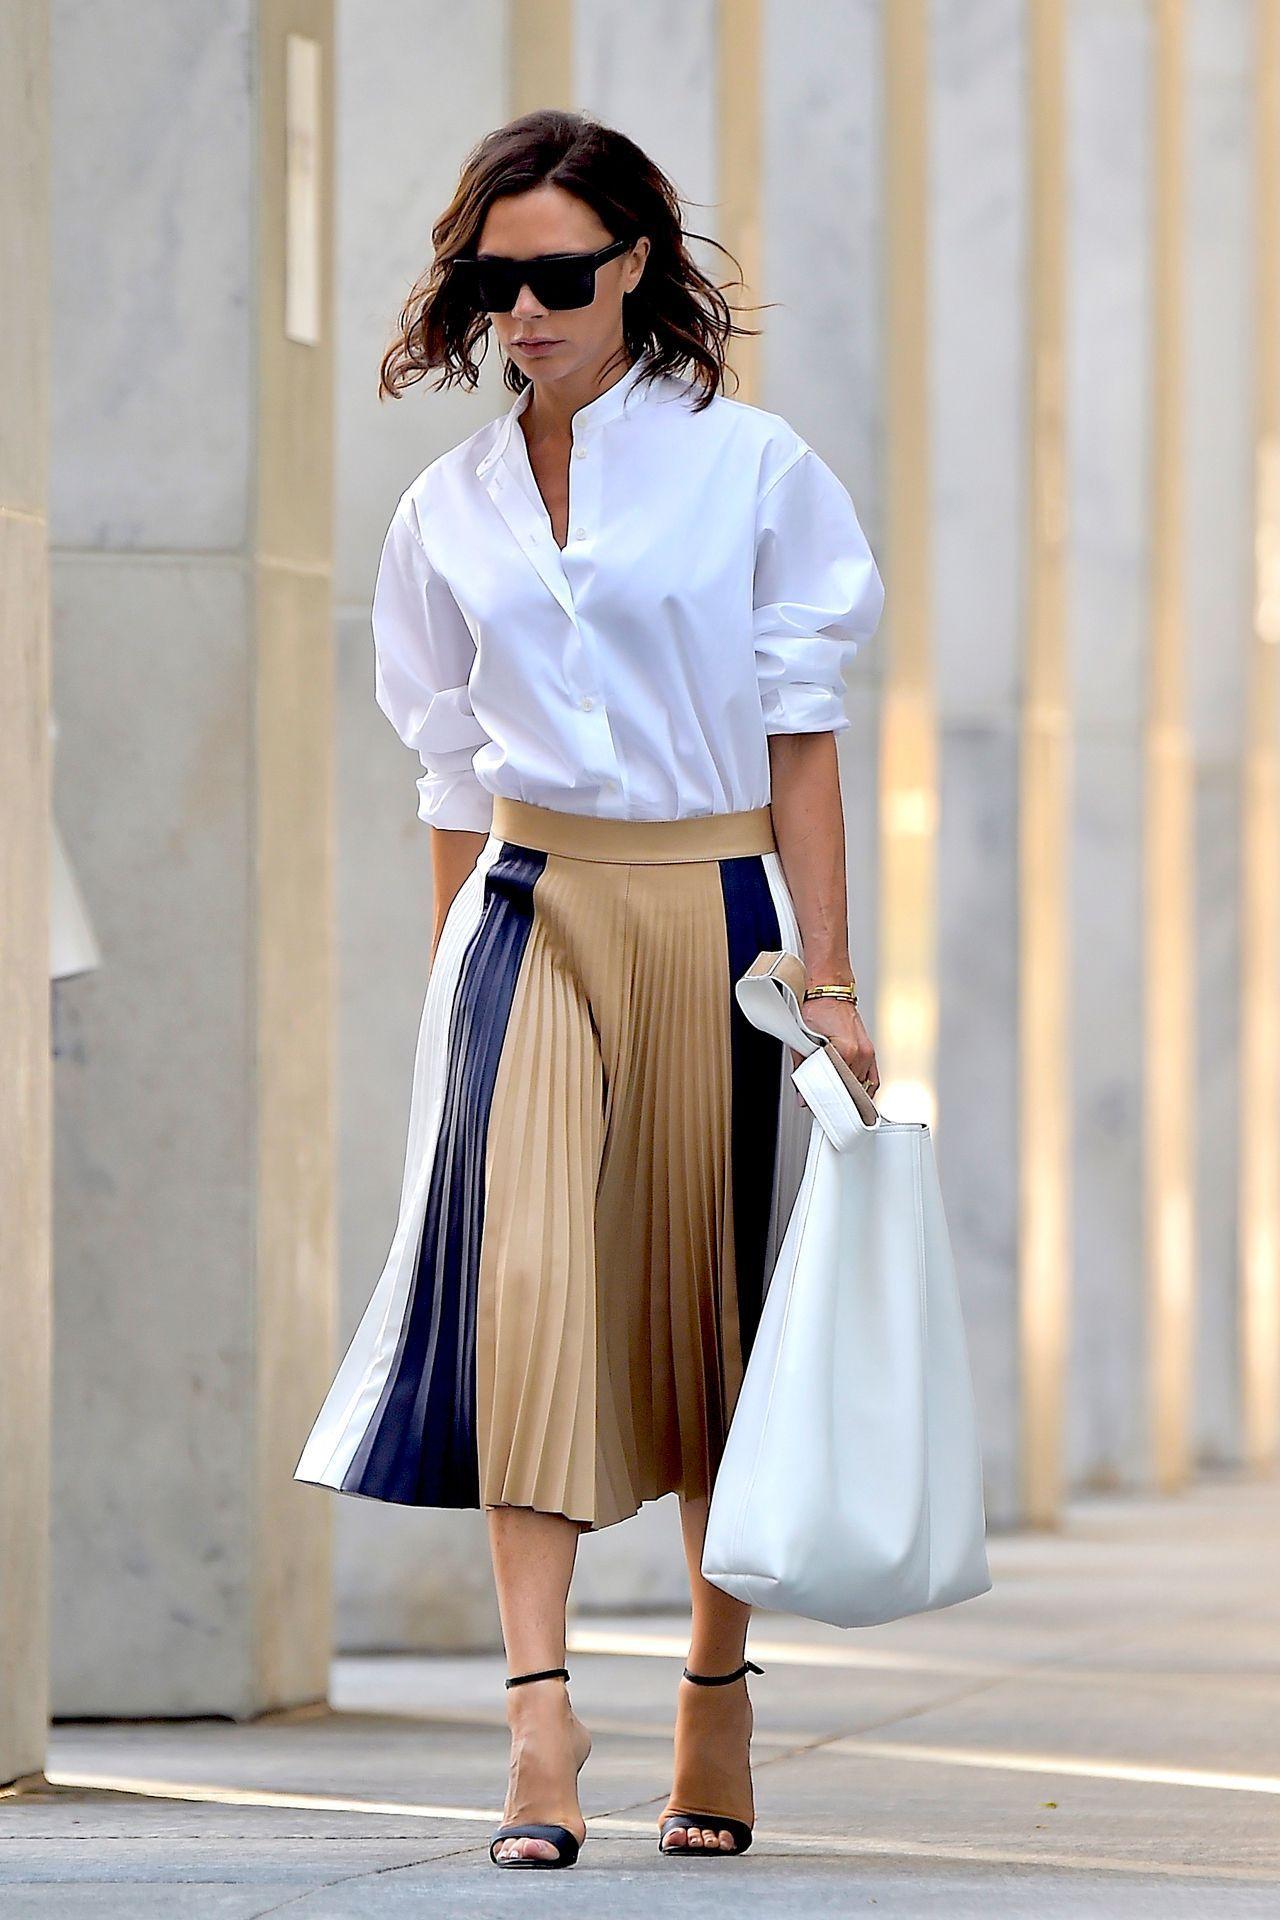 d9d93d948c Victoria Beckham style outfit clothes dress celebrity ootd singer designer  fashion sunglasses trousers pants skirt blouse tshirt shirt hoodie elegant  ...